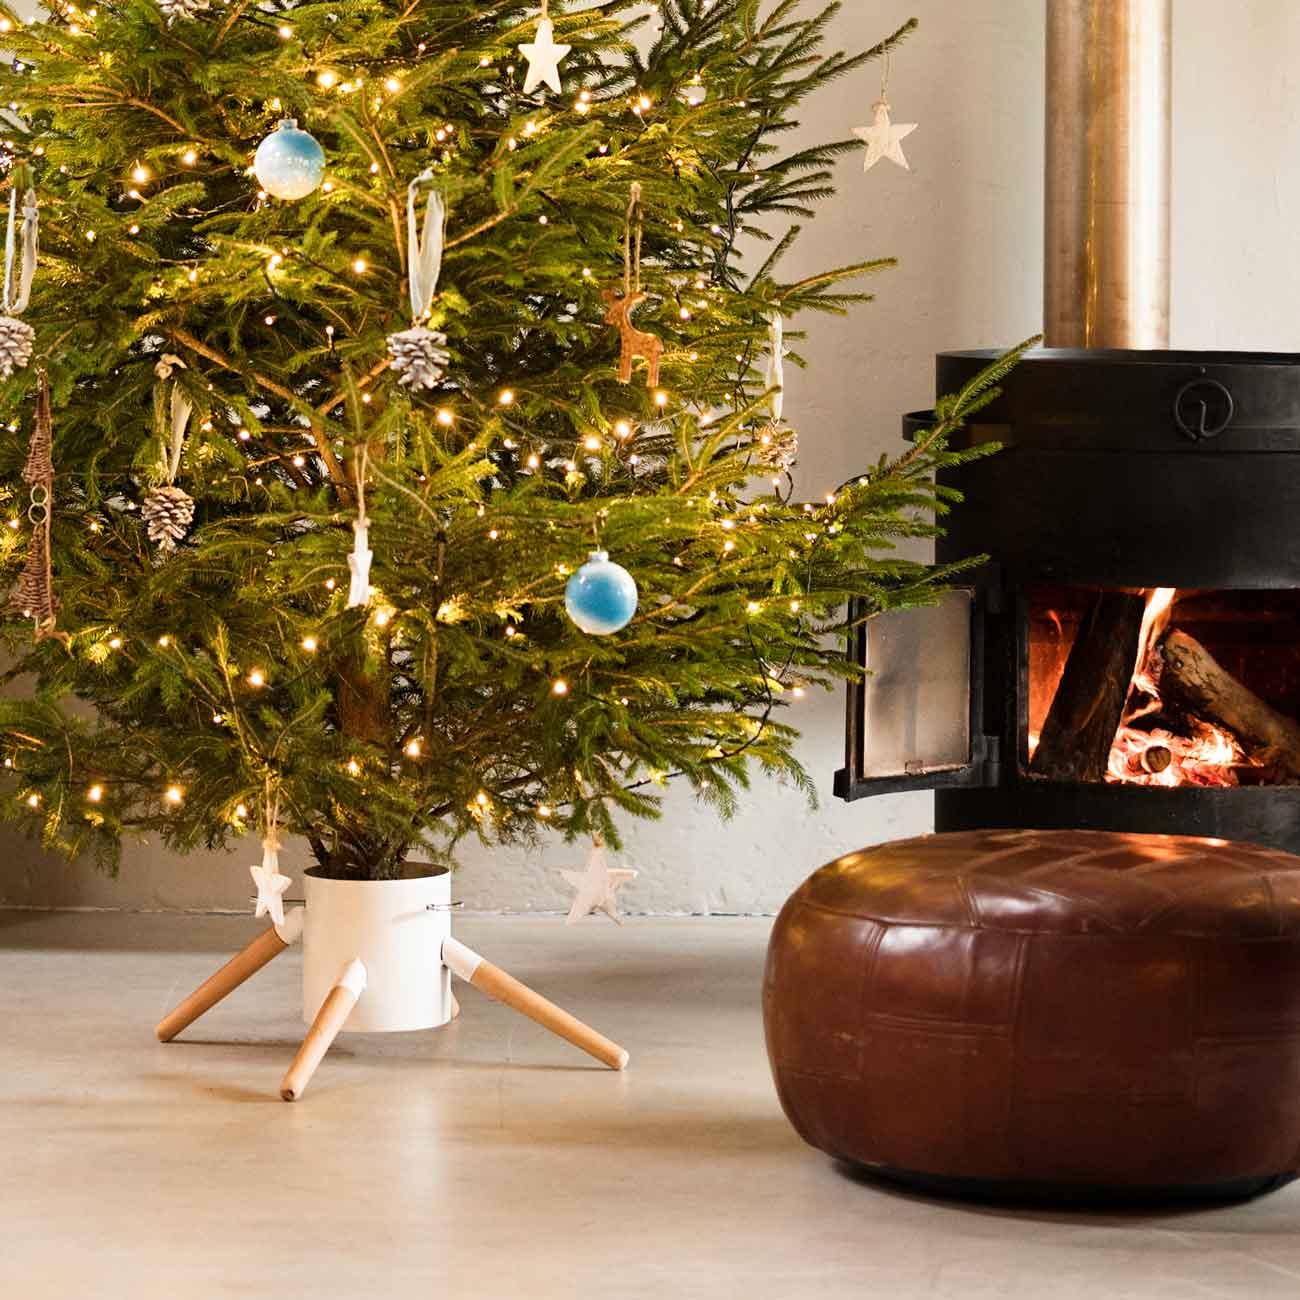 Tree Nest Decorations Home